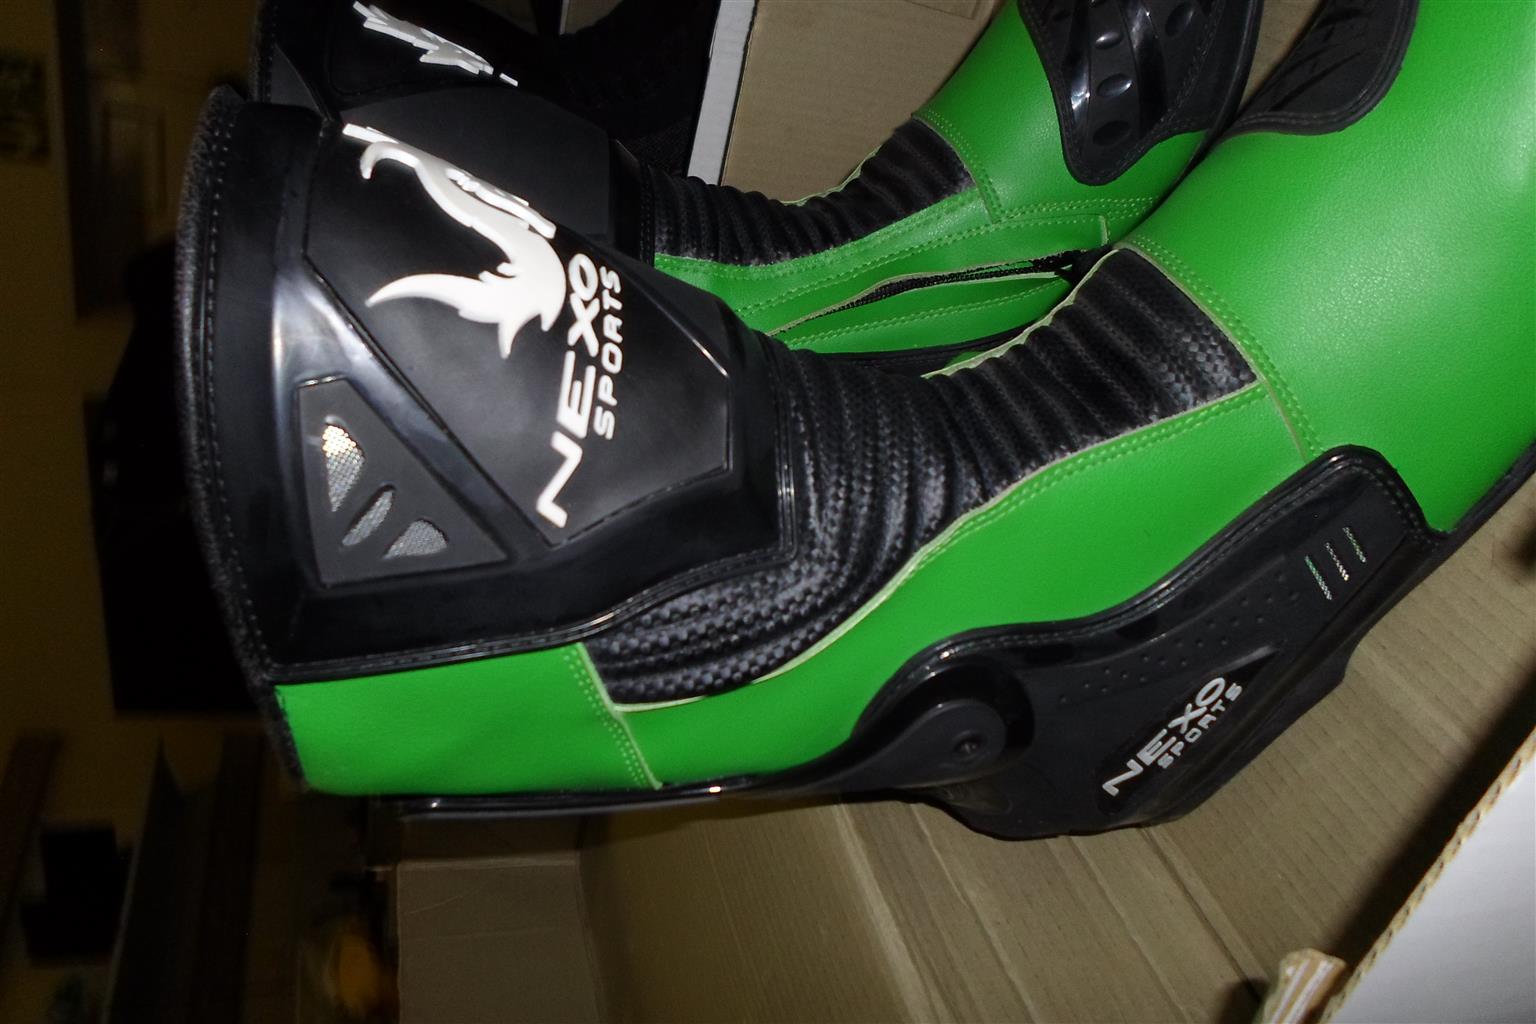 Size 47/13 Nexo Sports Motorcycle Boots